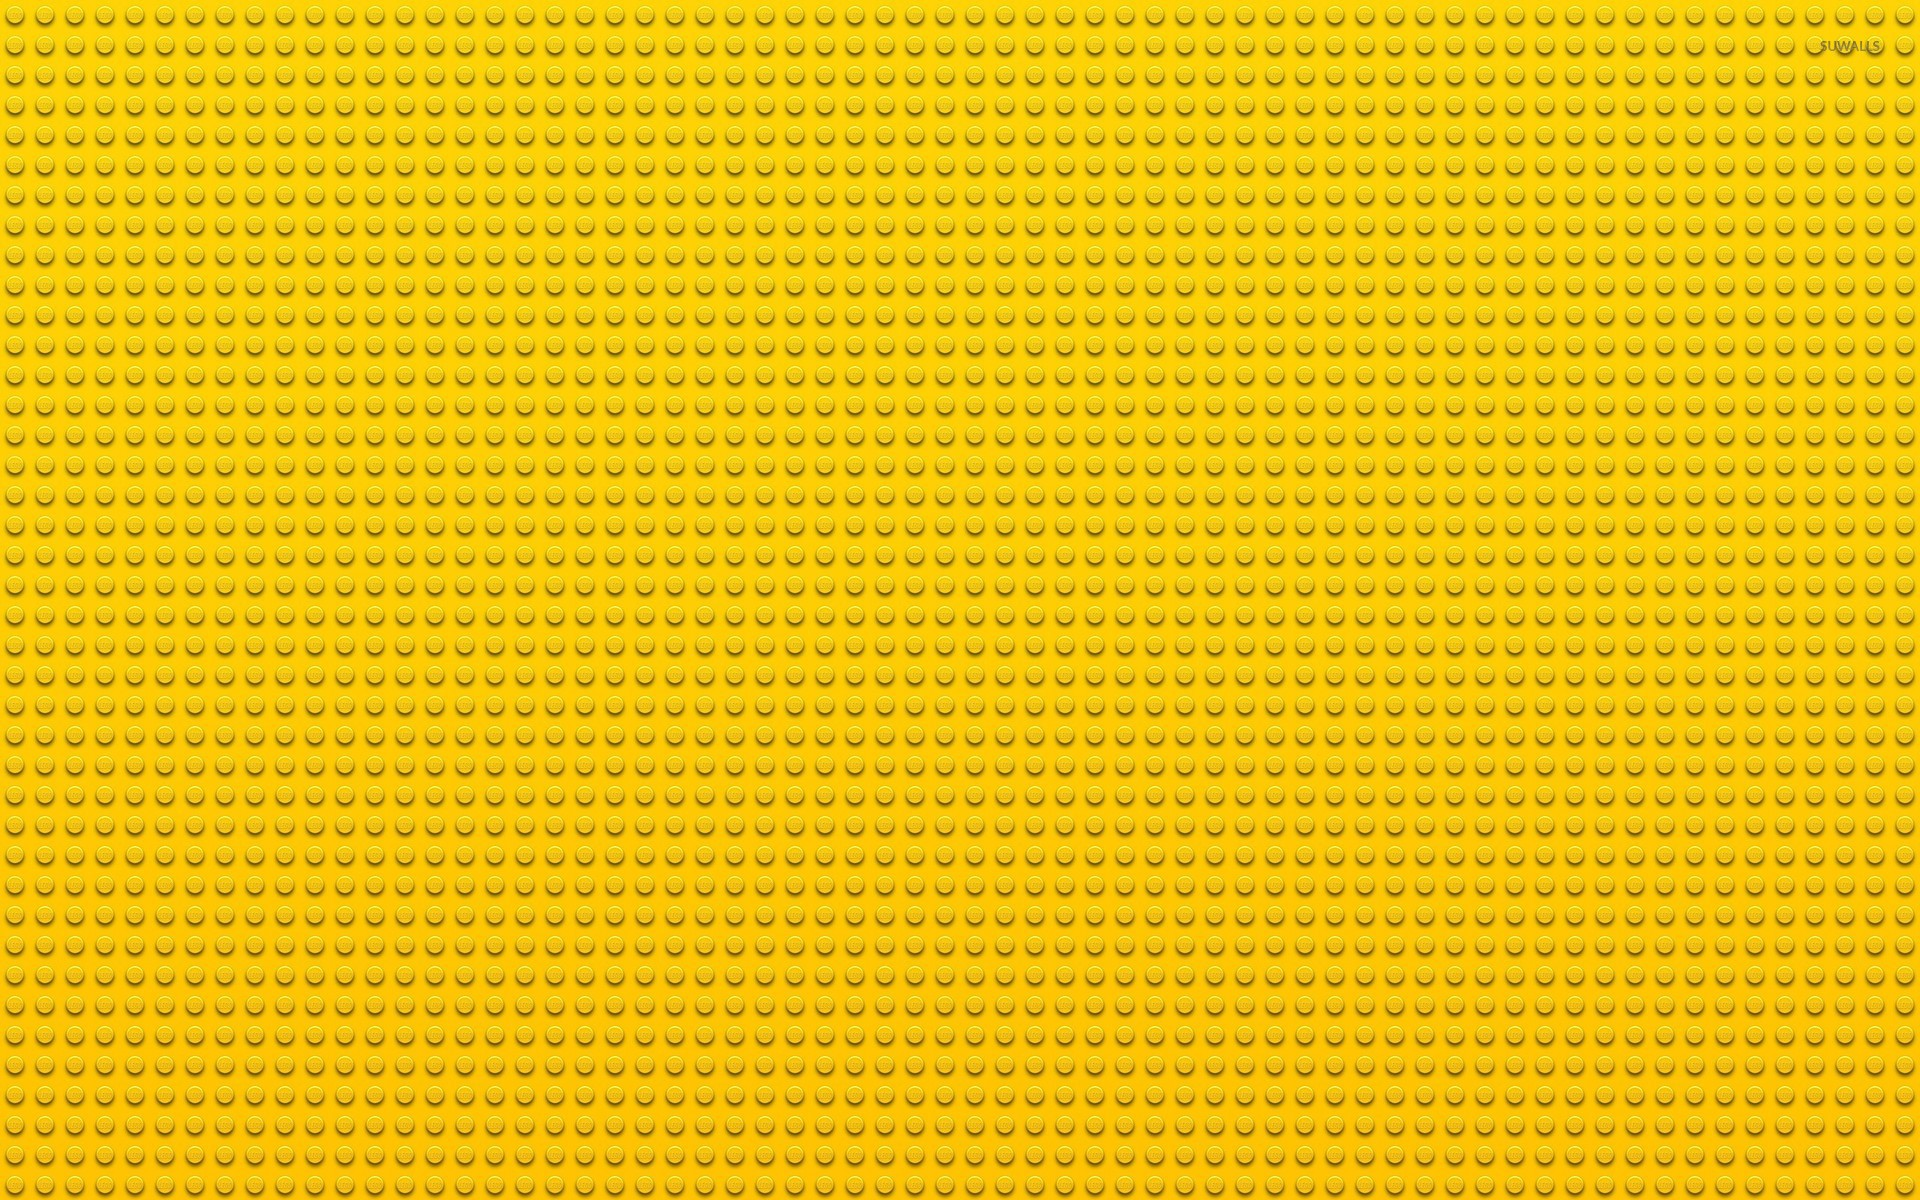 Lego Wallpaper For Walls Yellow Lego hd Wallpaper 1920x1200